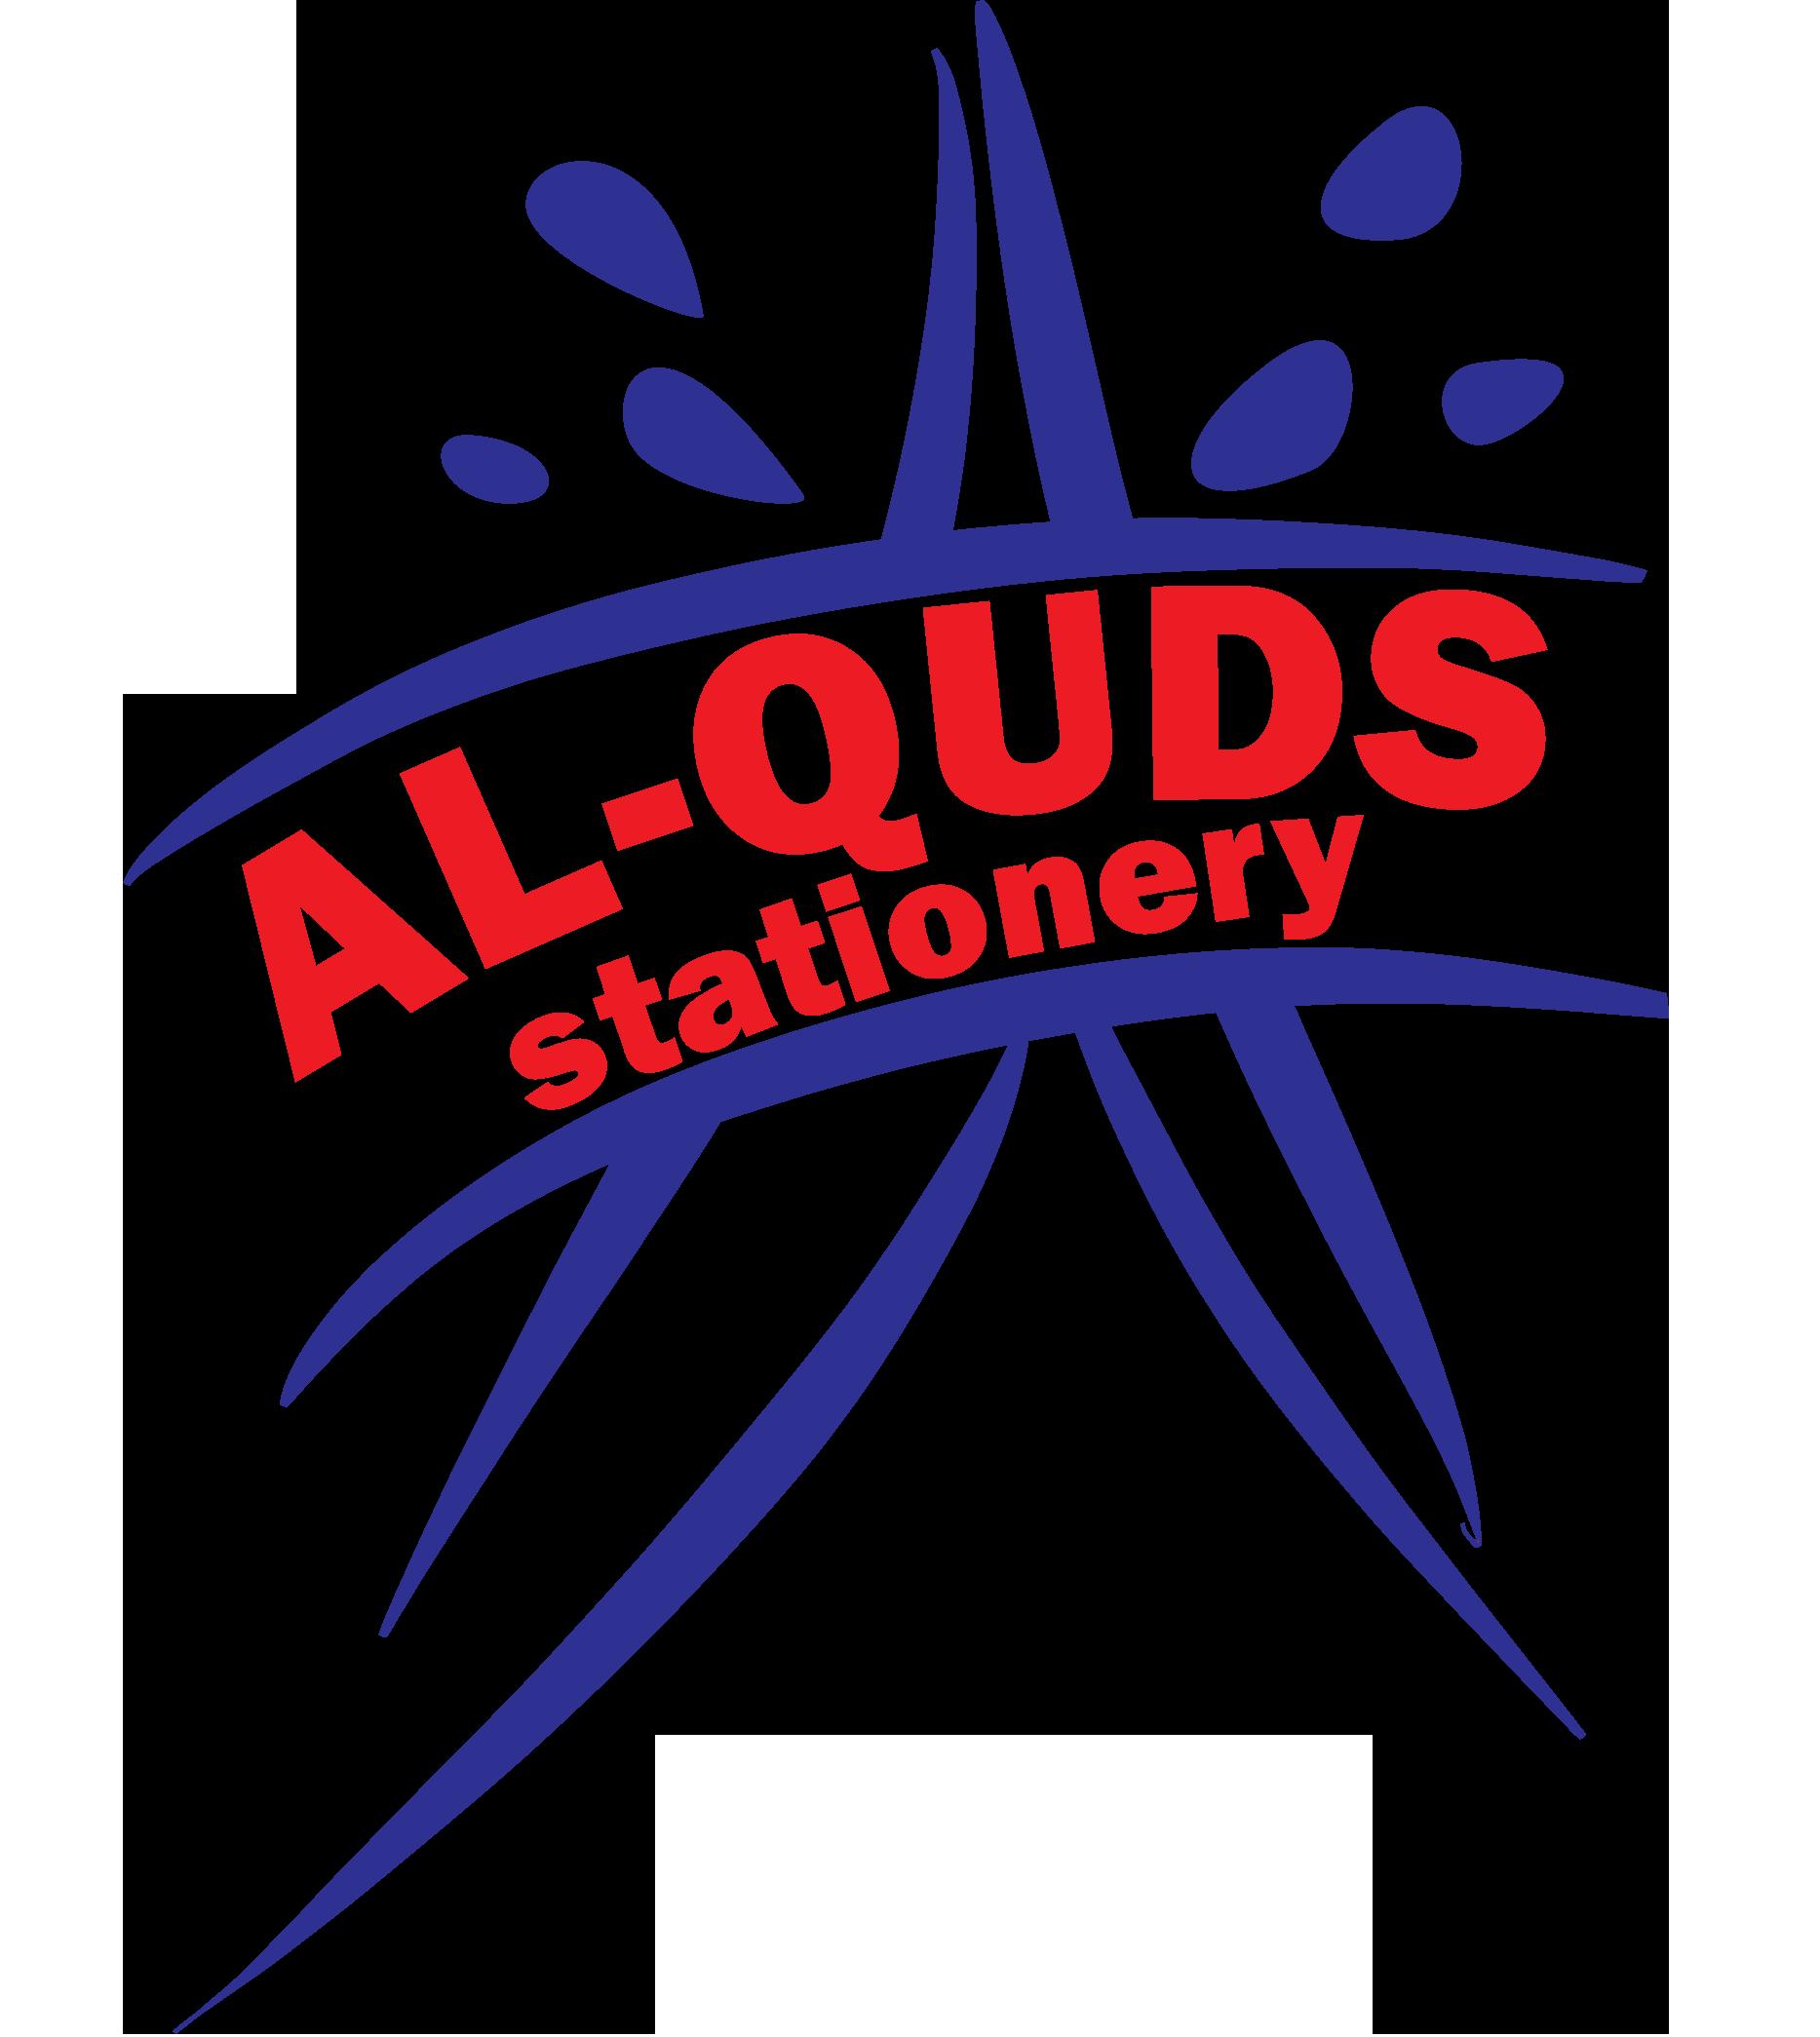 Al-Quds STC